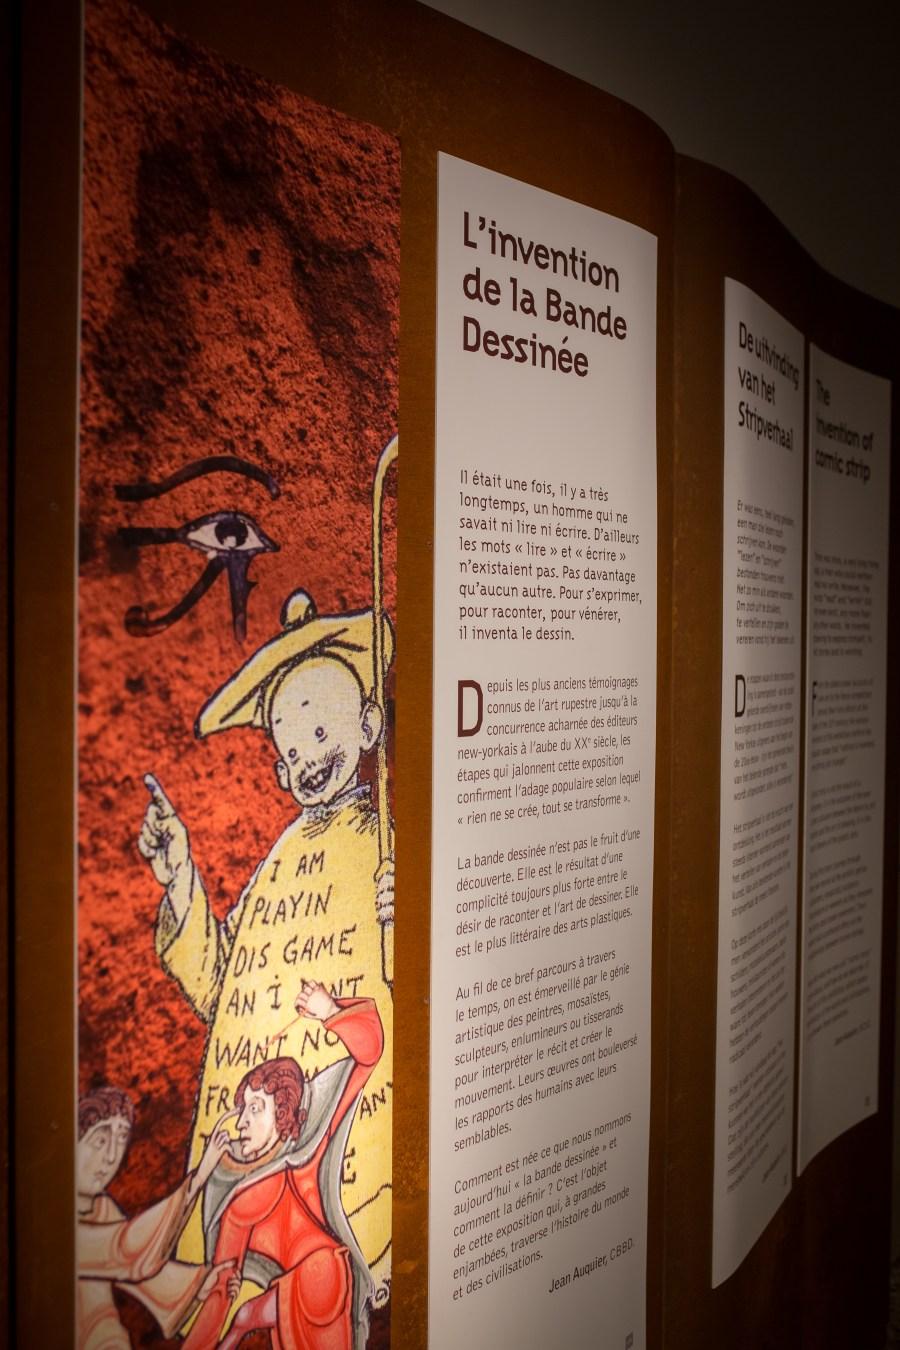 bruxelles-musee-bande dessinée-belgique-hall-entree-escalier-tintin-herge-histoire